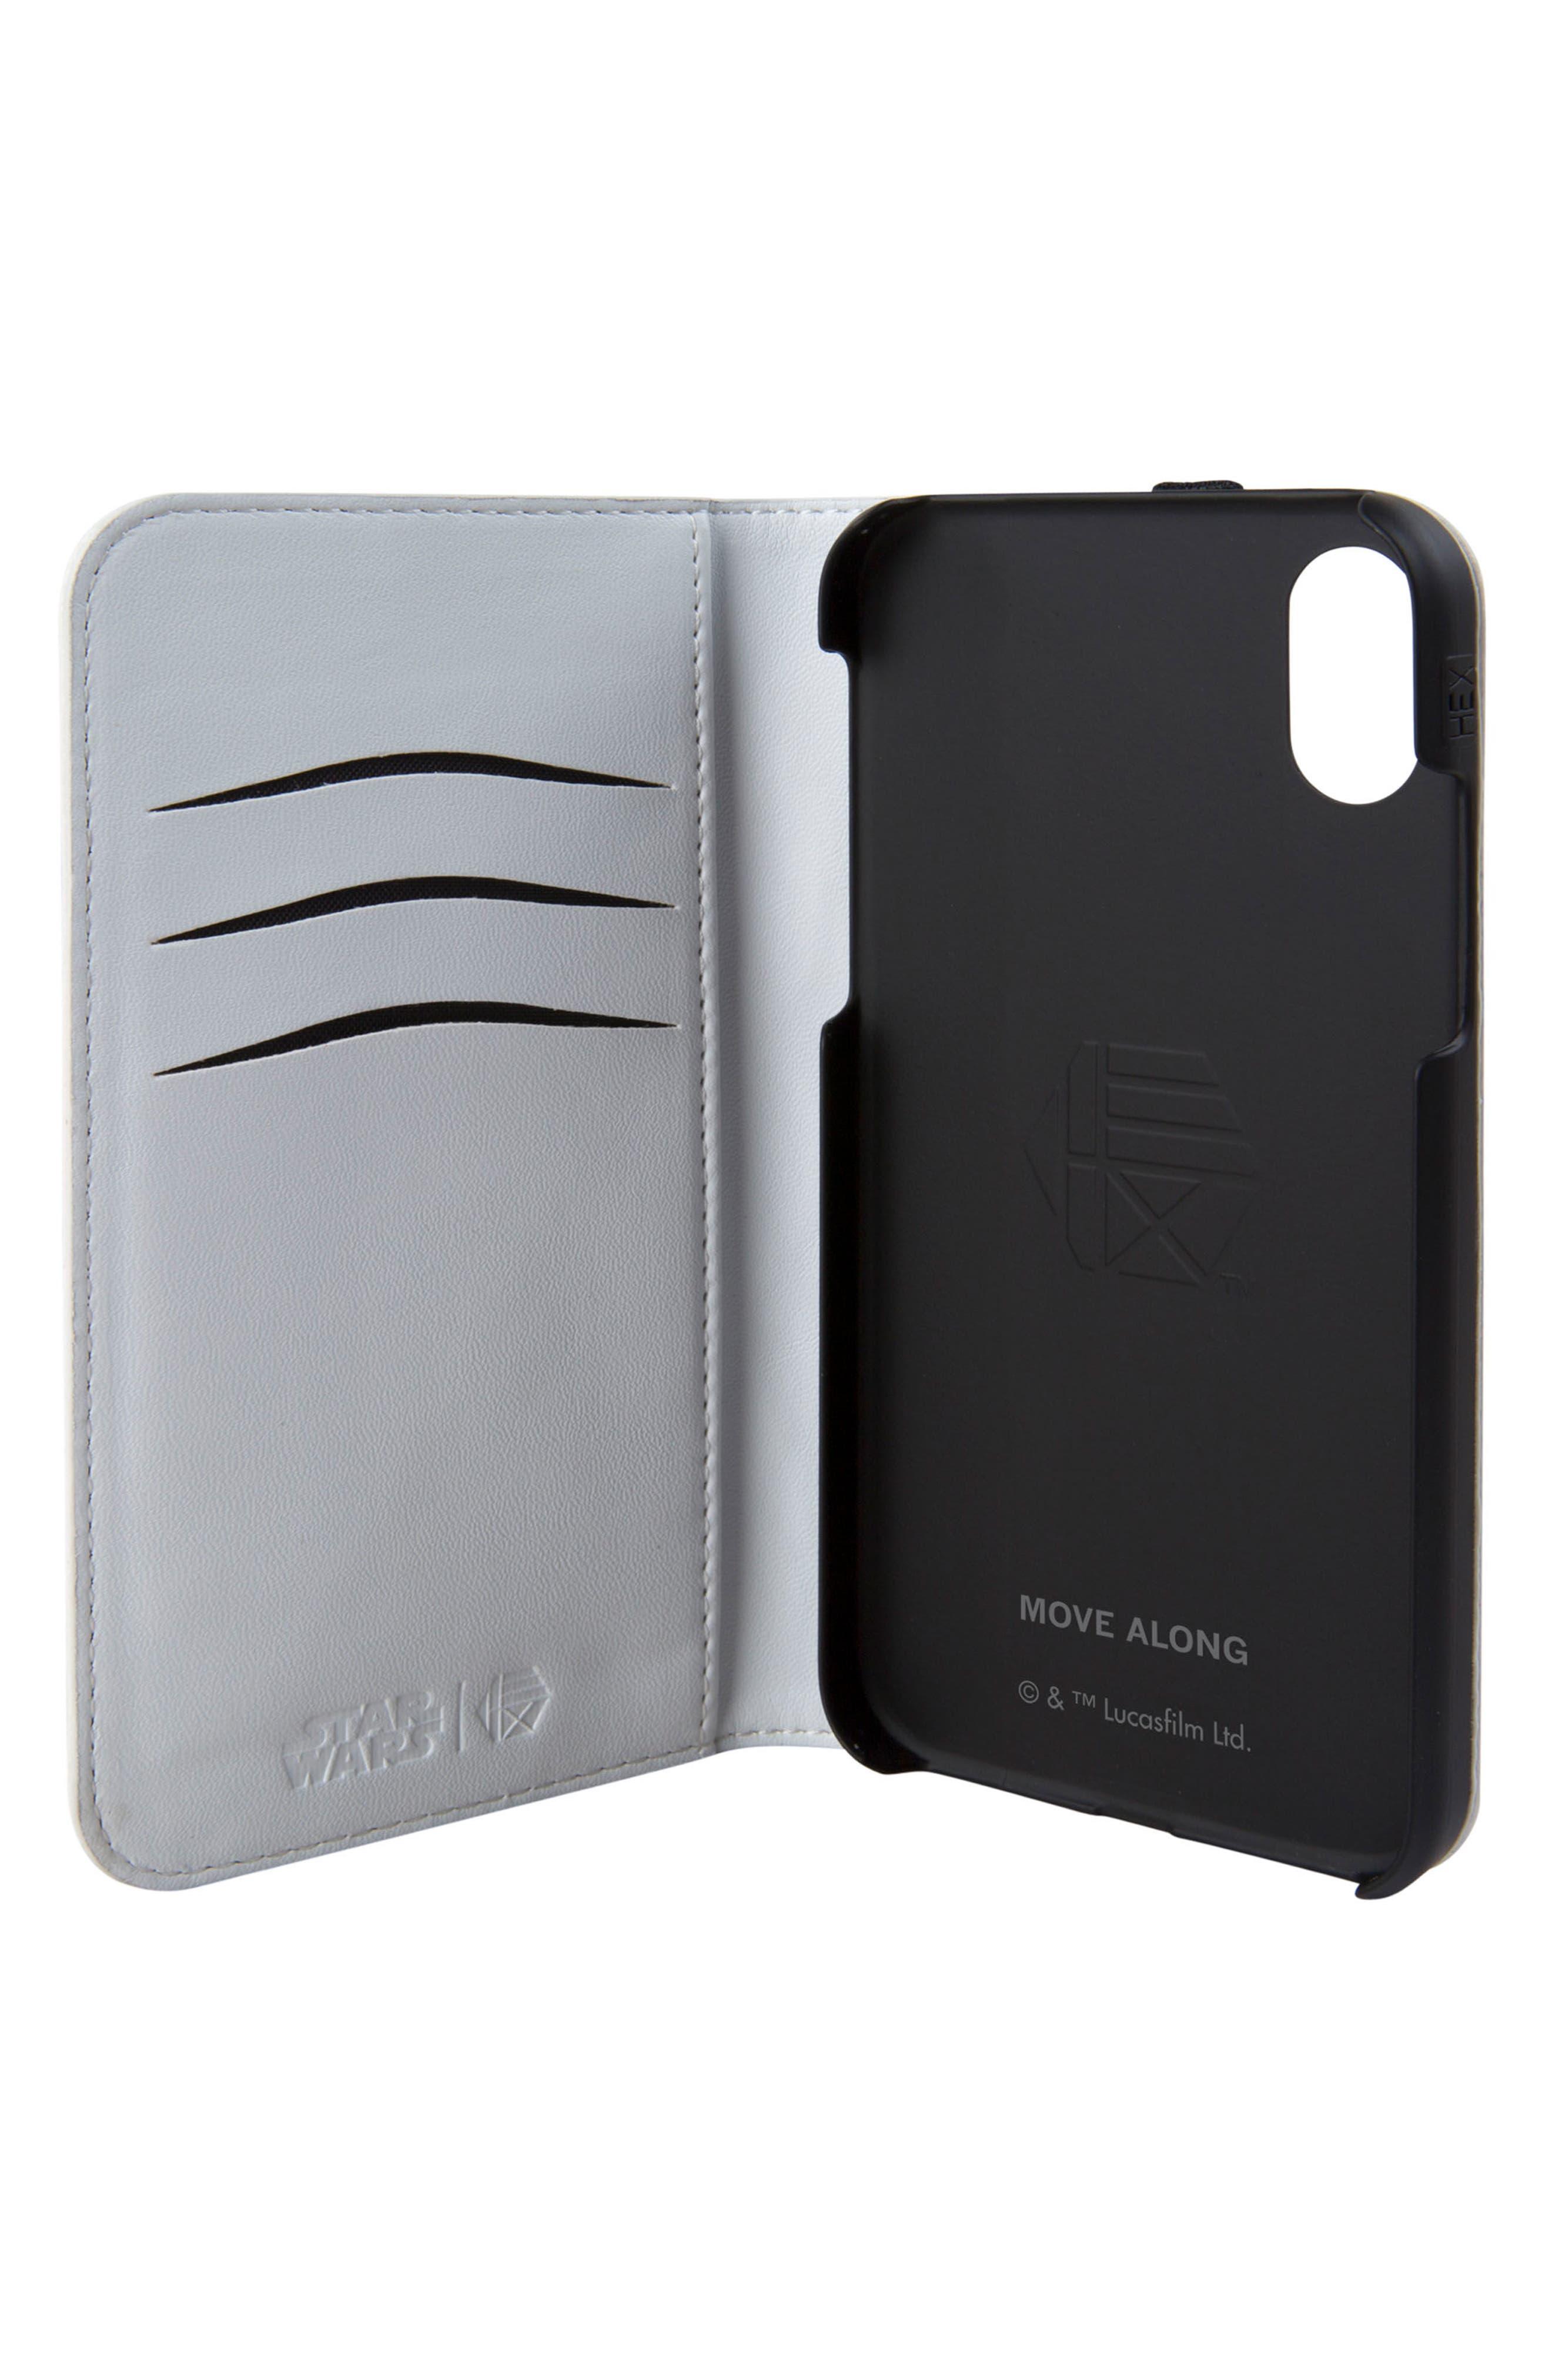 Stormtrooper iPhone X Wallet Case,                             Alternate thumbnail 2, color,                             158